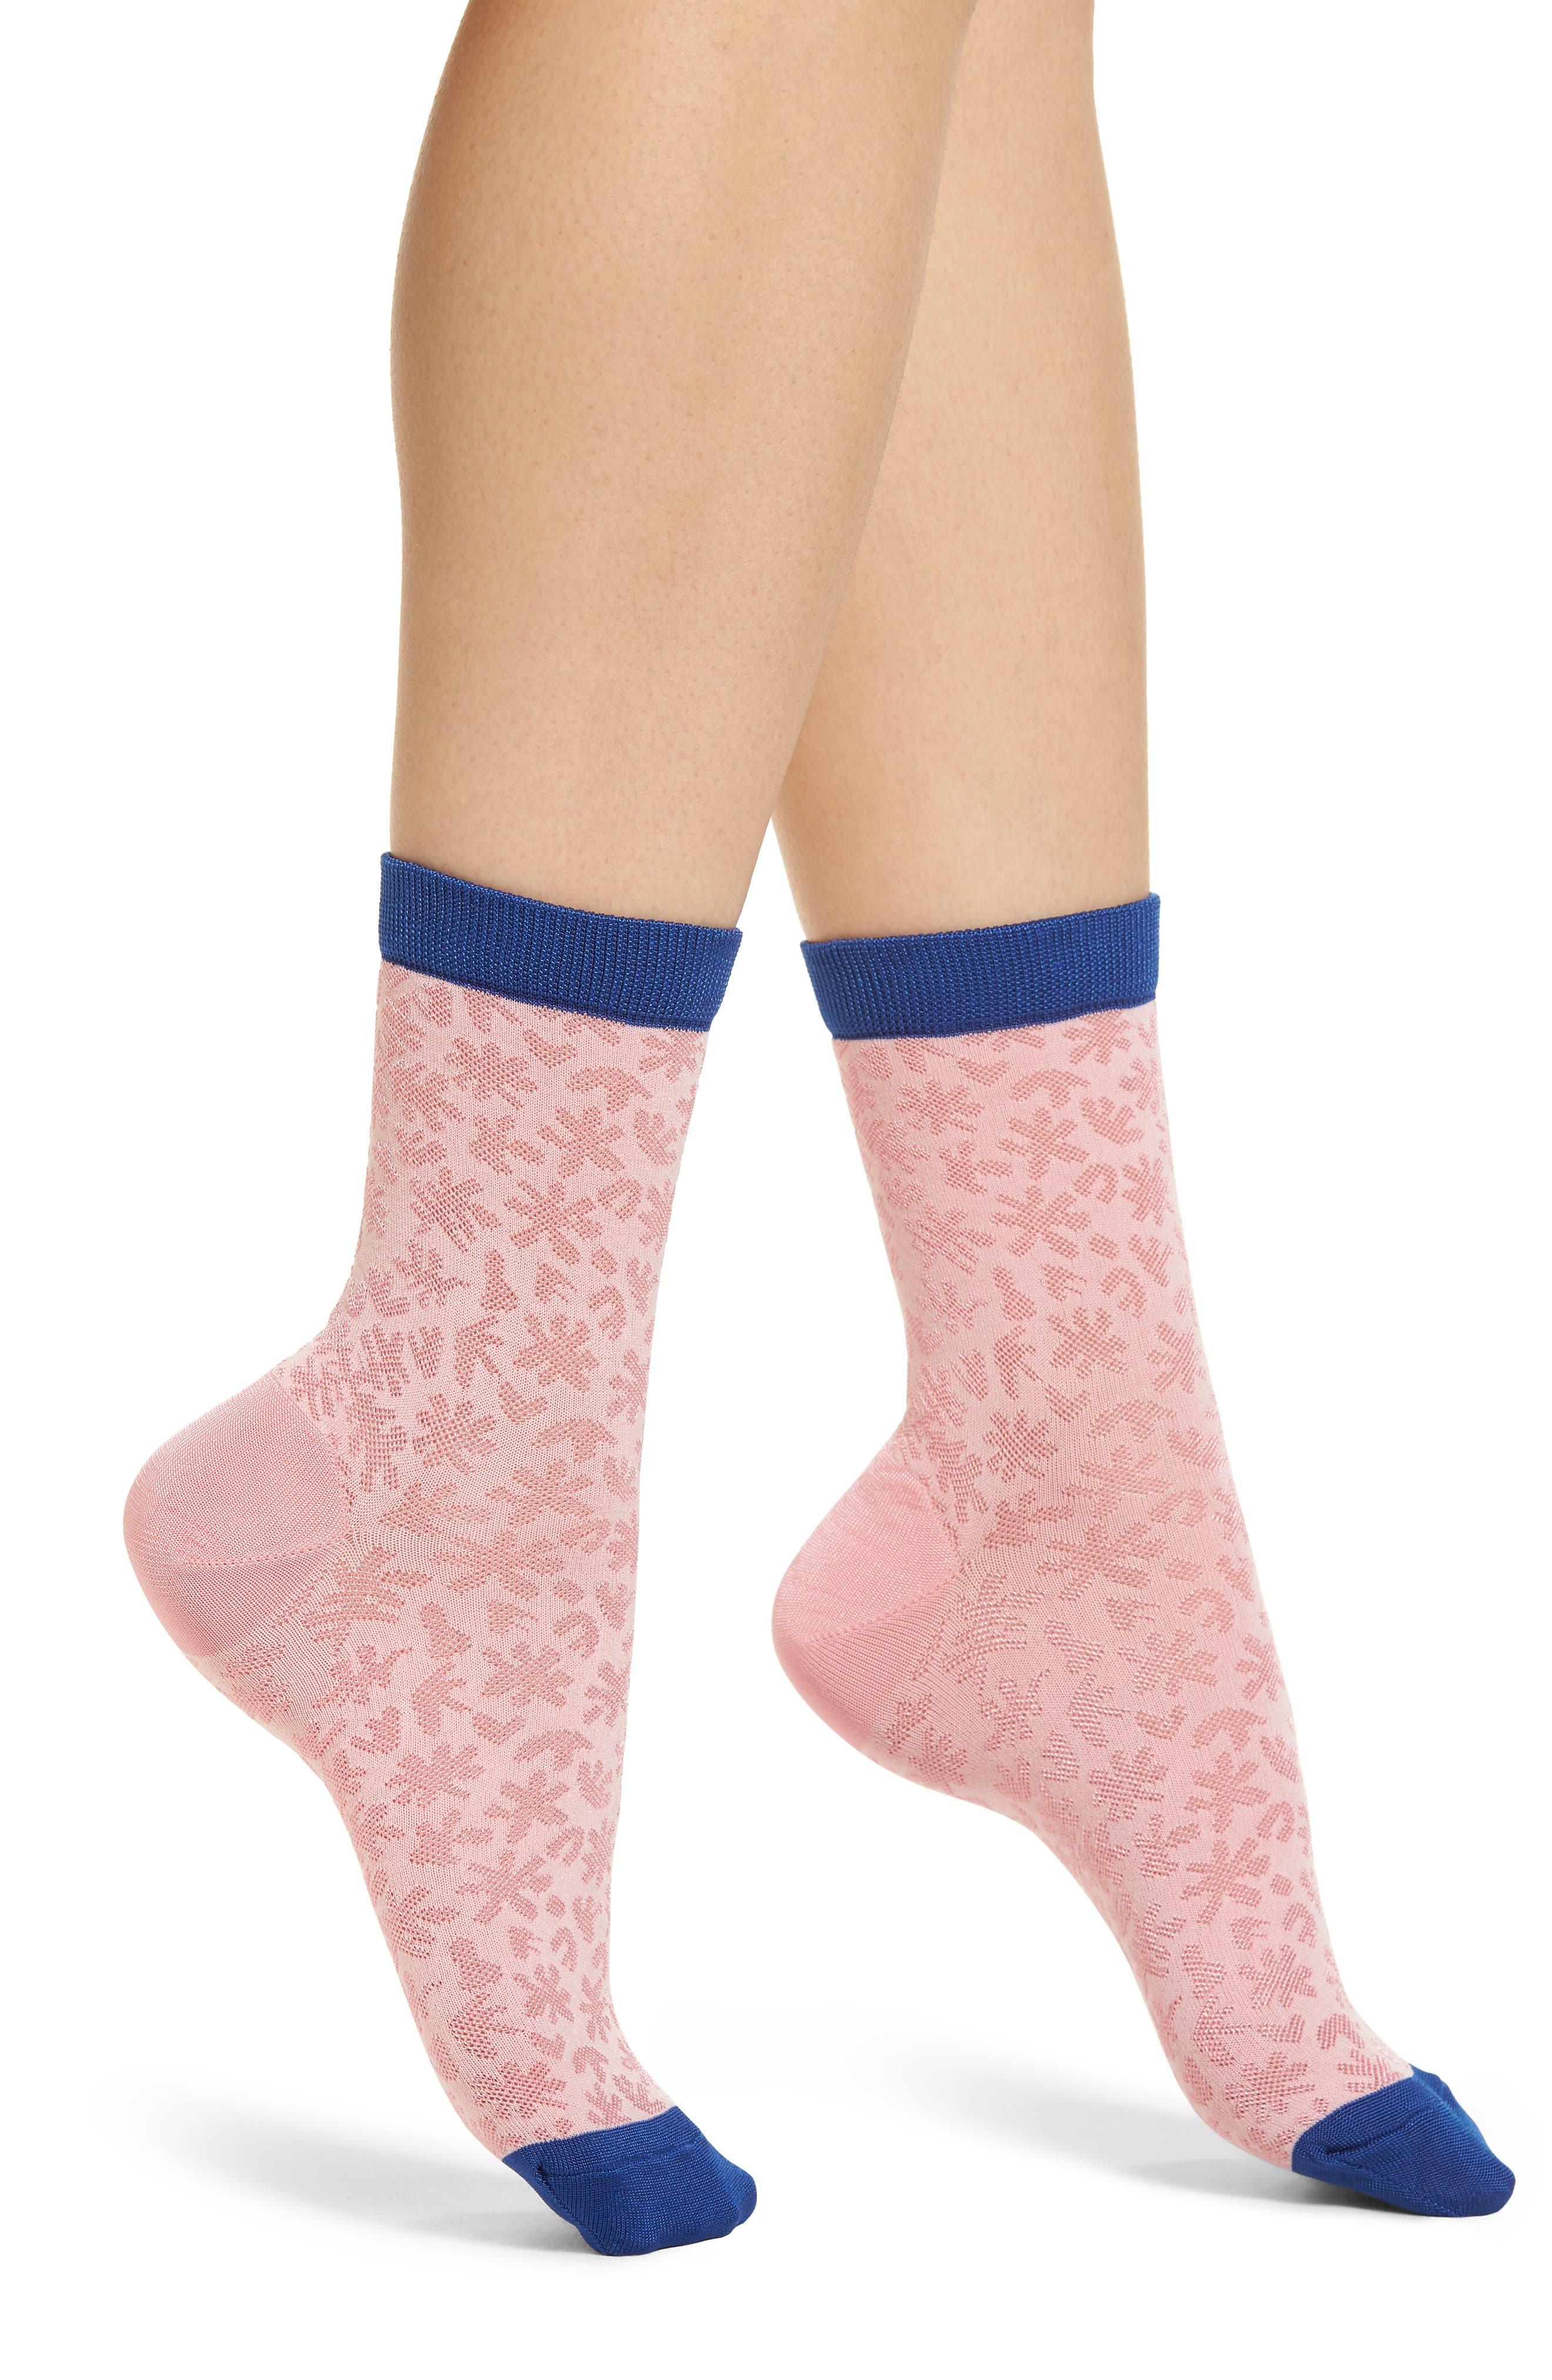 Lotta Ankle Socks,                             Main thumbnail 1, color,                             680